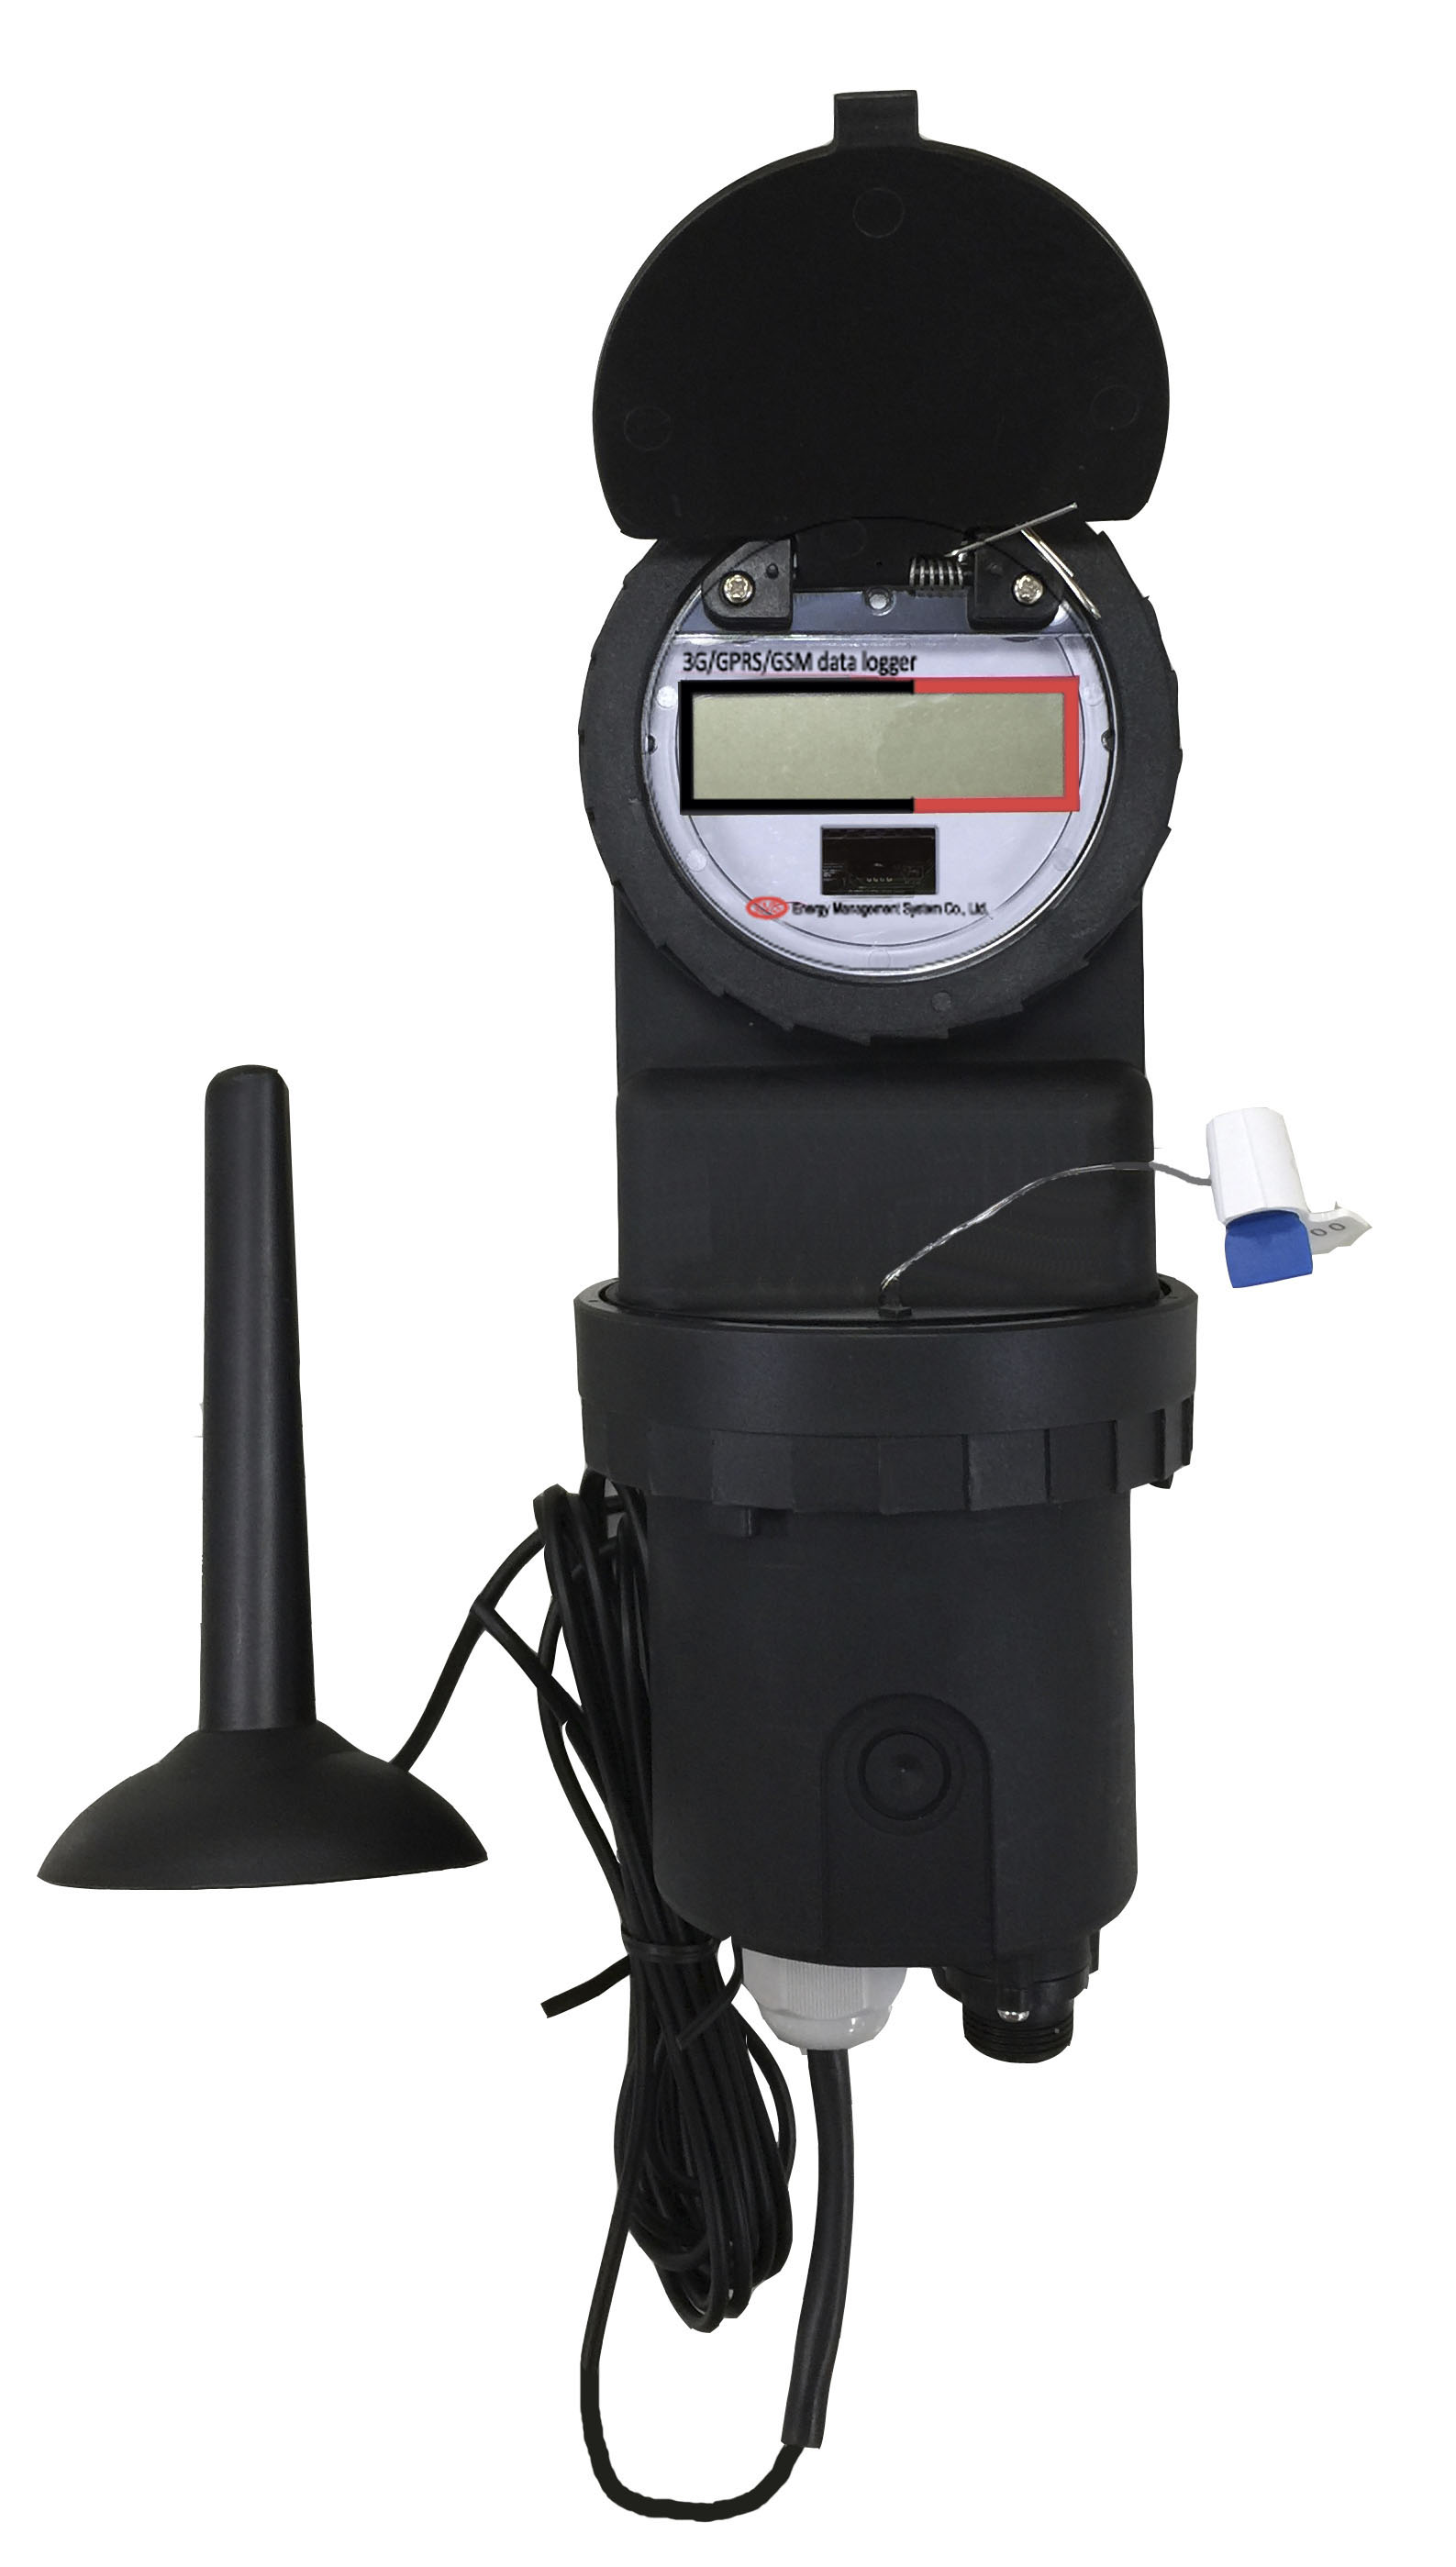 GSM/GPRS Wireless Transmission Data Logger (3G/4G) / ENERGY MANAGEMENT SYSTEM CO., LTD.